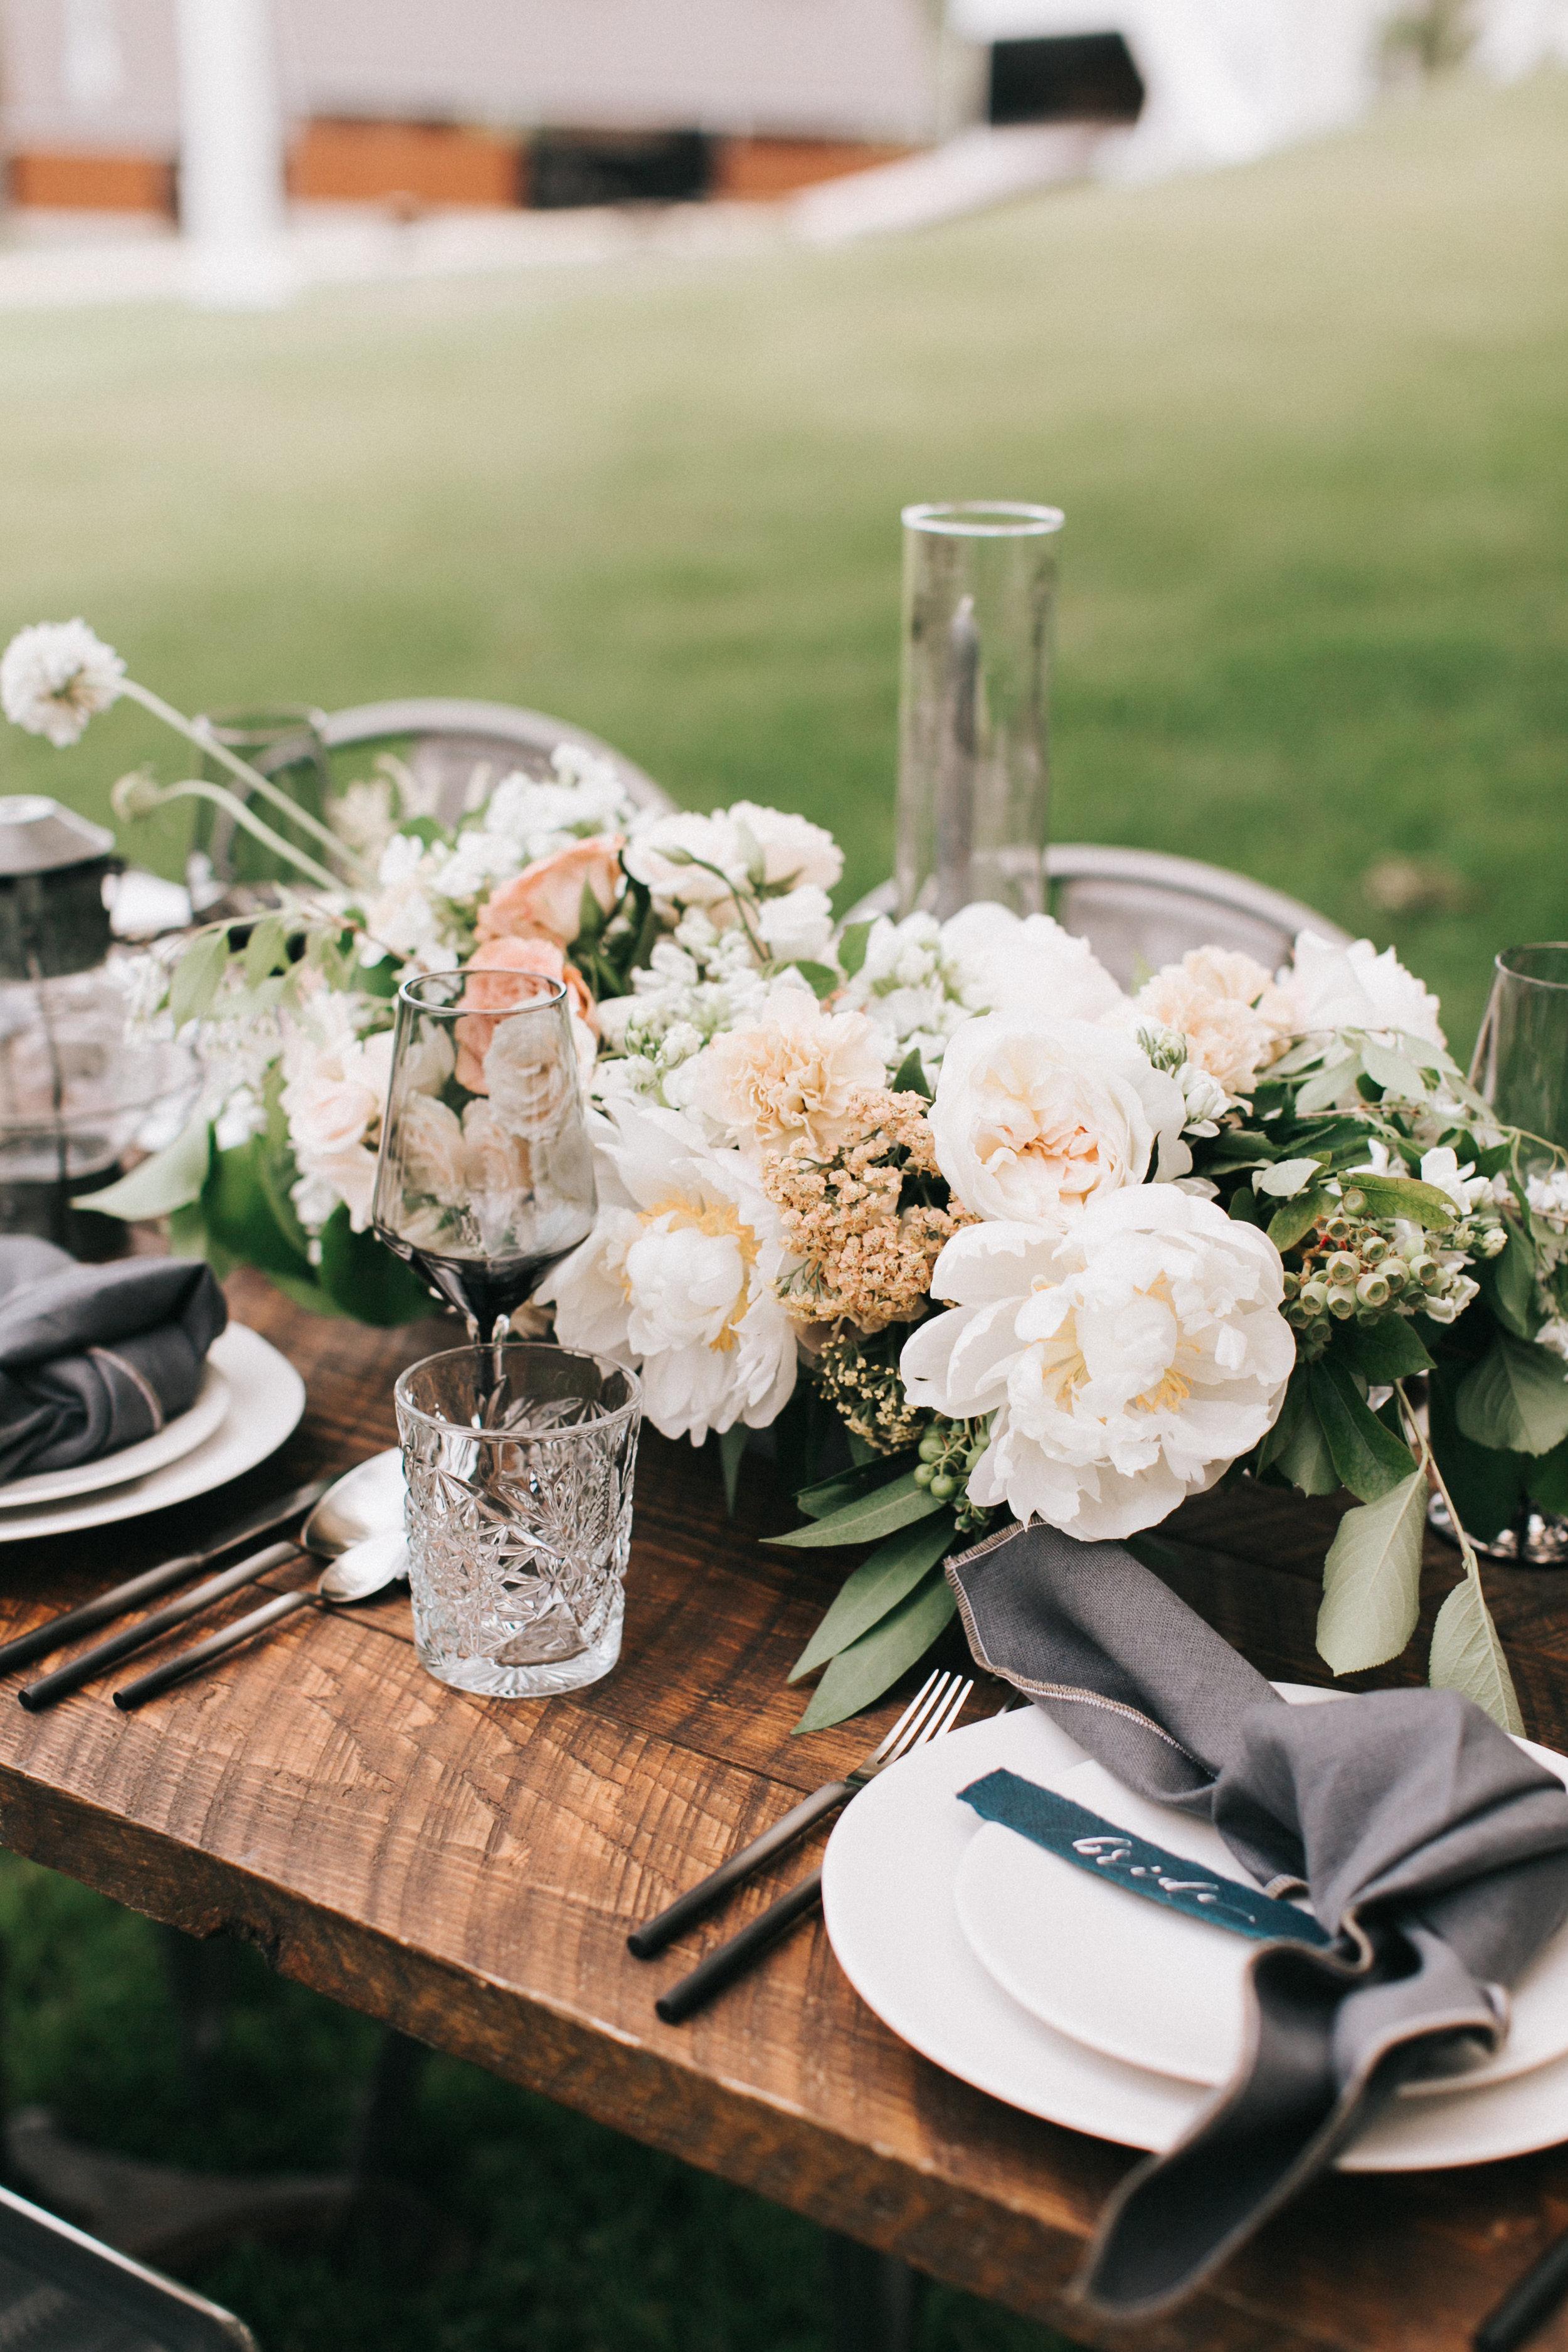 Watershed-Floral-Maine-Maritime-Wedding-Bridal-Bouquet-Centerpieces-0024.jpg